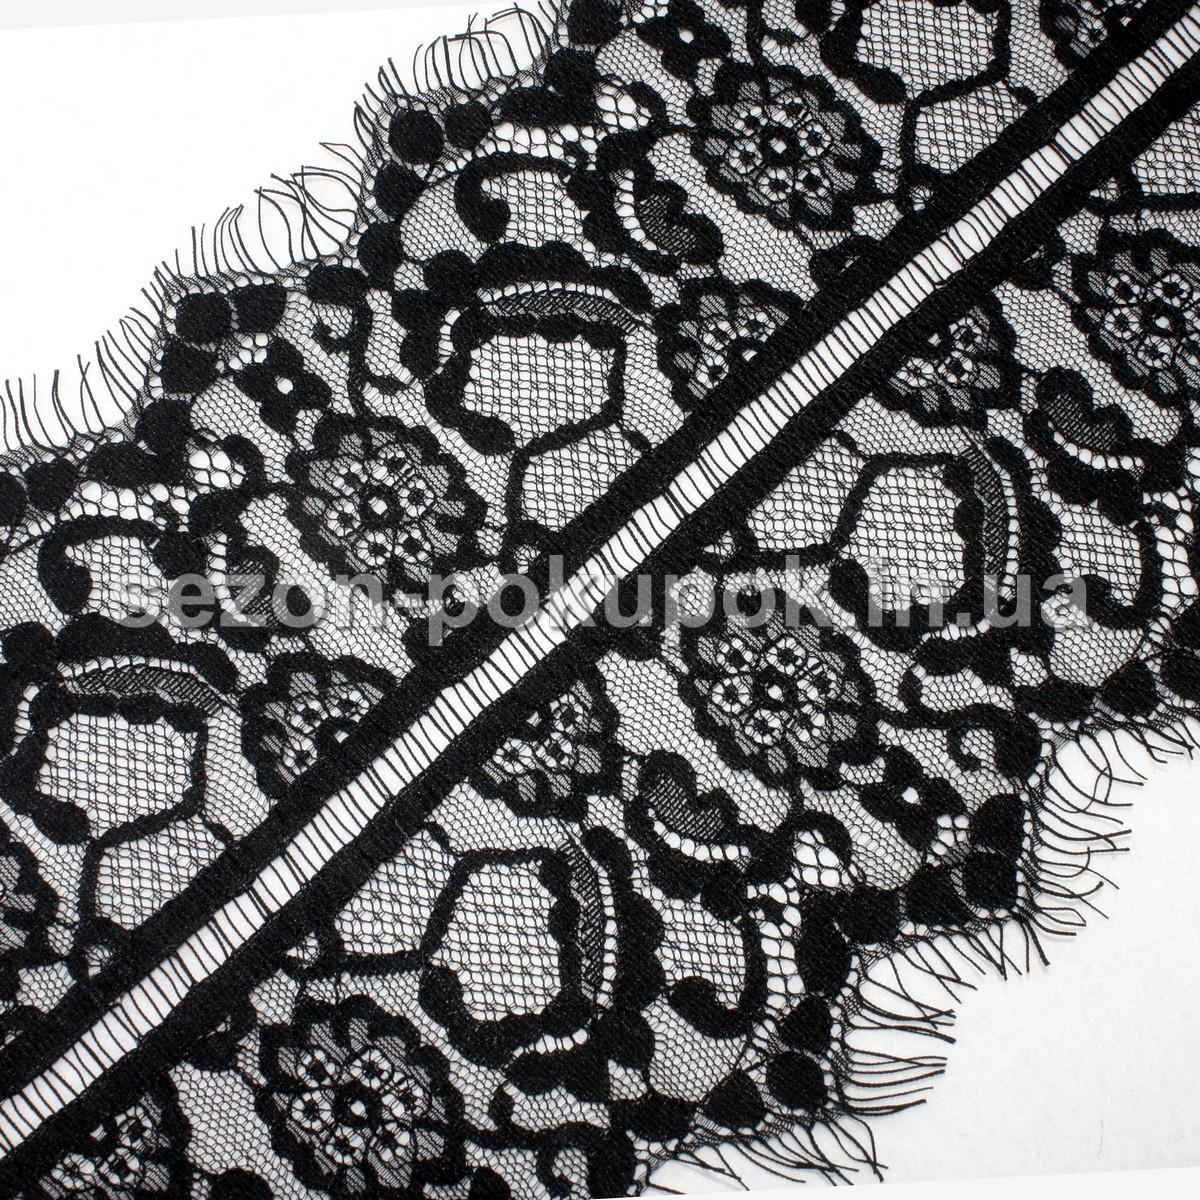 Французское кружево (Шантильи, с ресничками) ширина 18см (цена за 3 м). Цвет - черный, фото 1